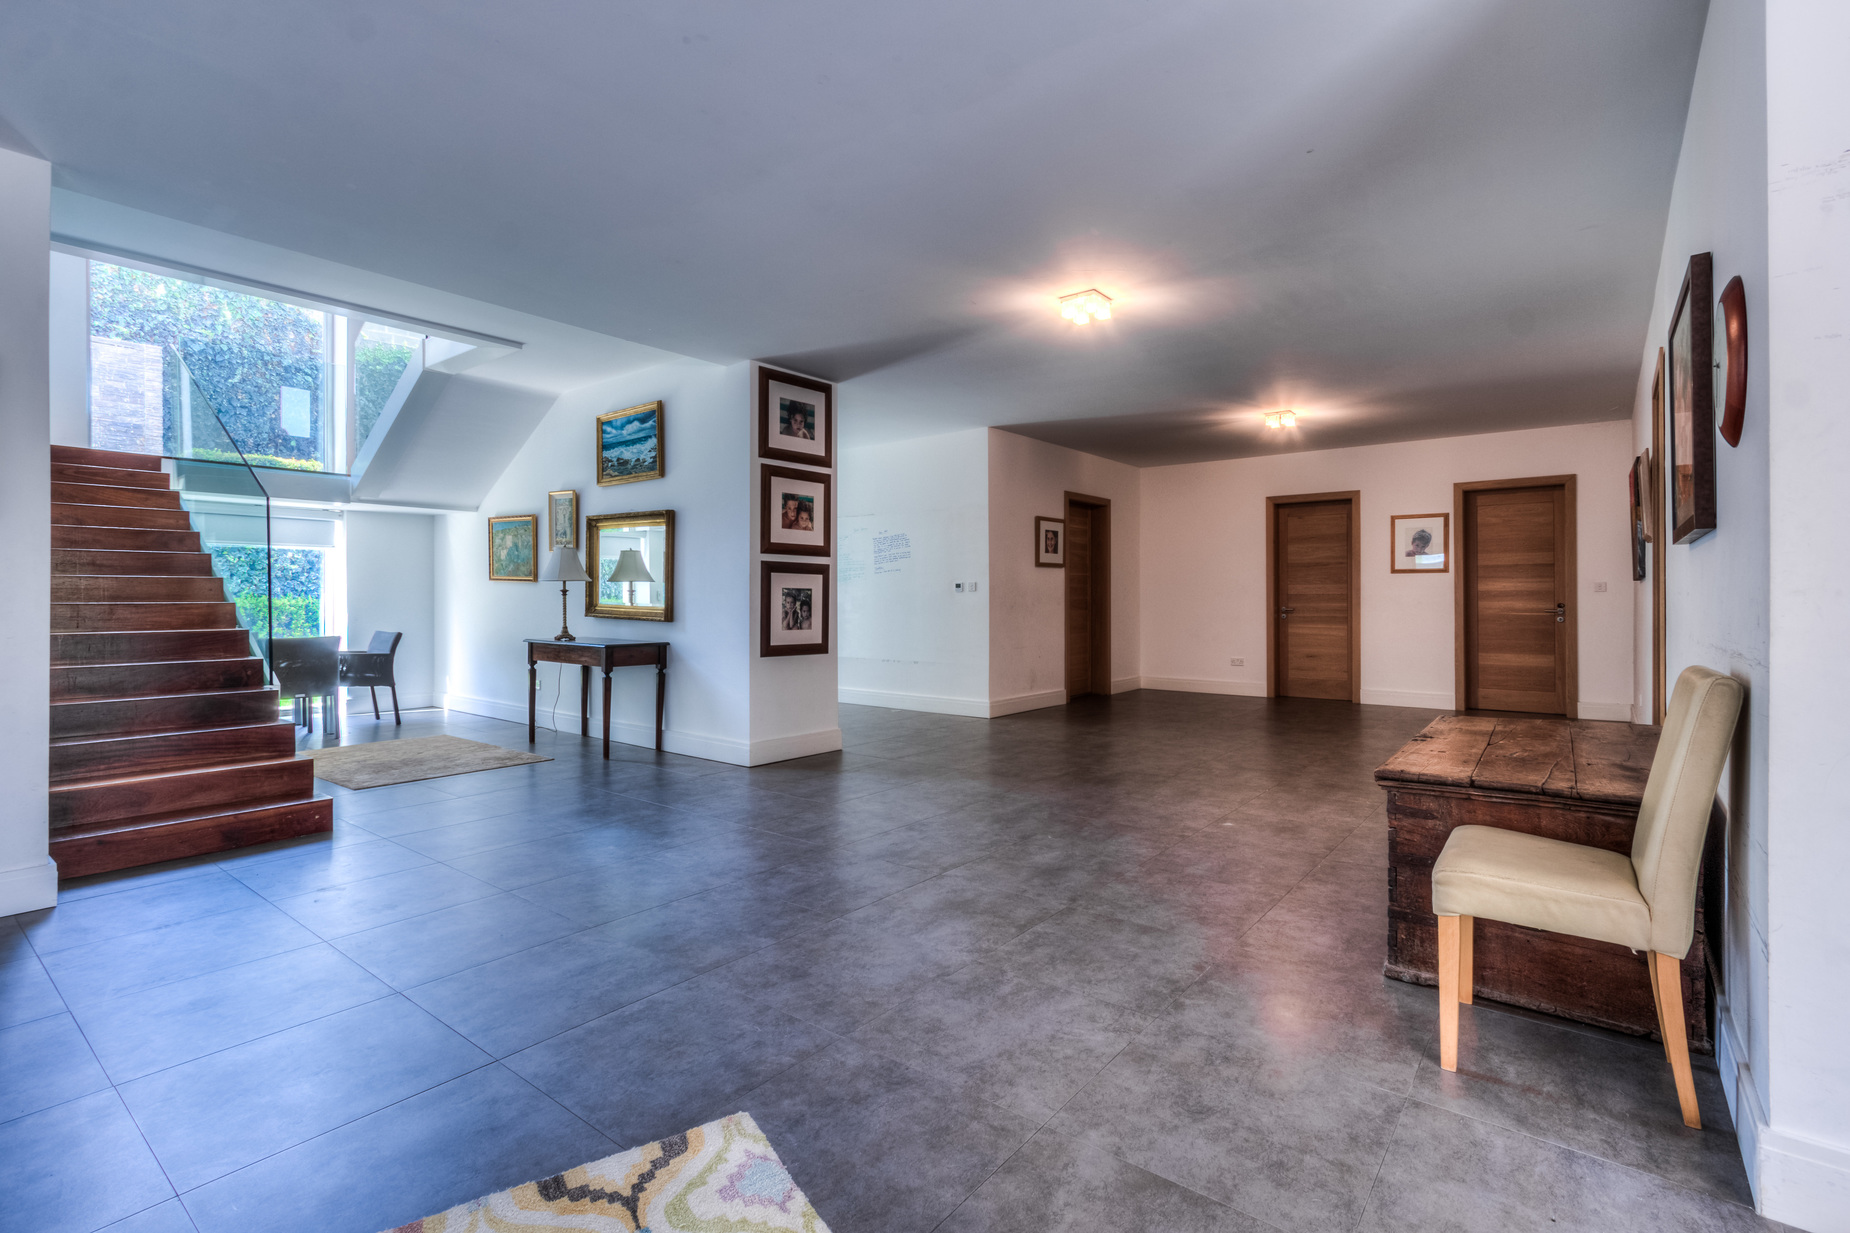 7 bed Villa For Sale in Bahar ic-Caghaq, Bahar ic-Caghaq - thumb 18